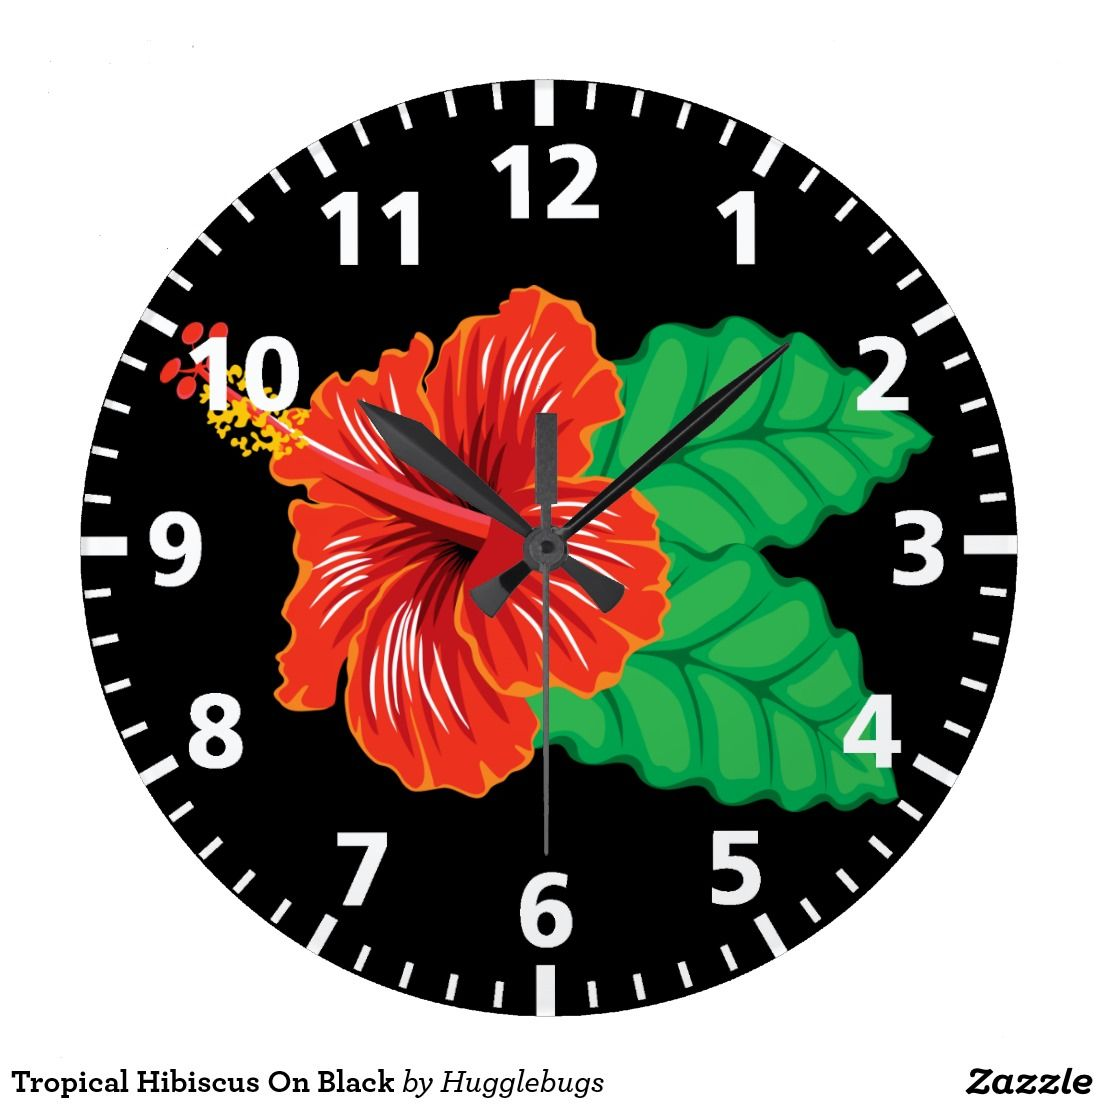 Tropical Hibiscus On Black